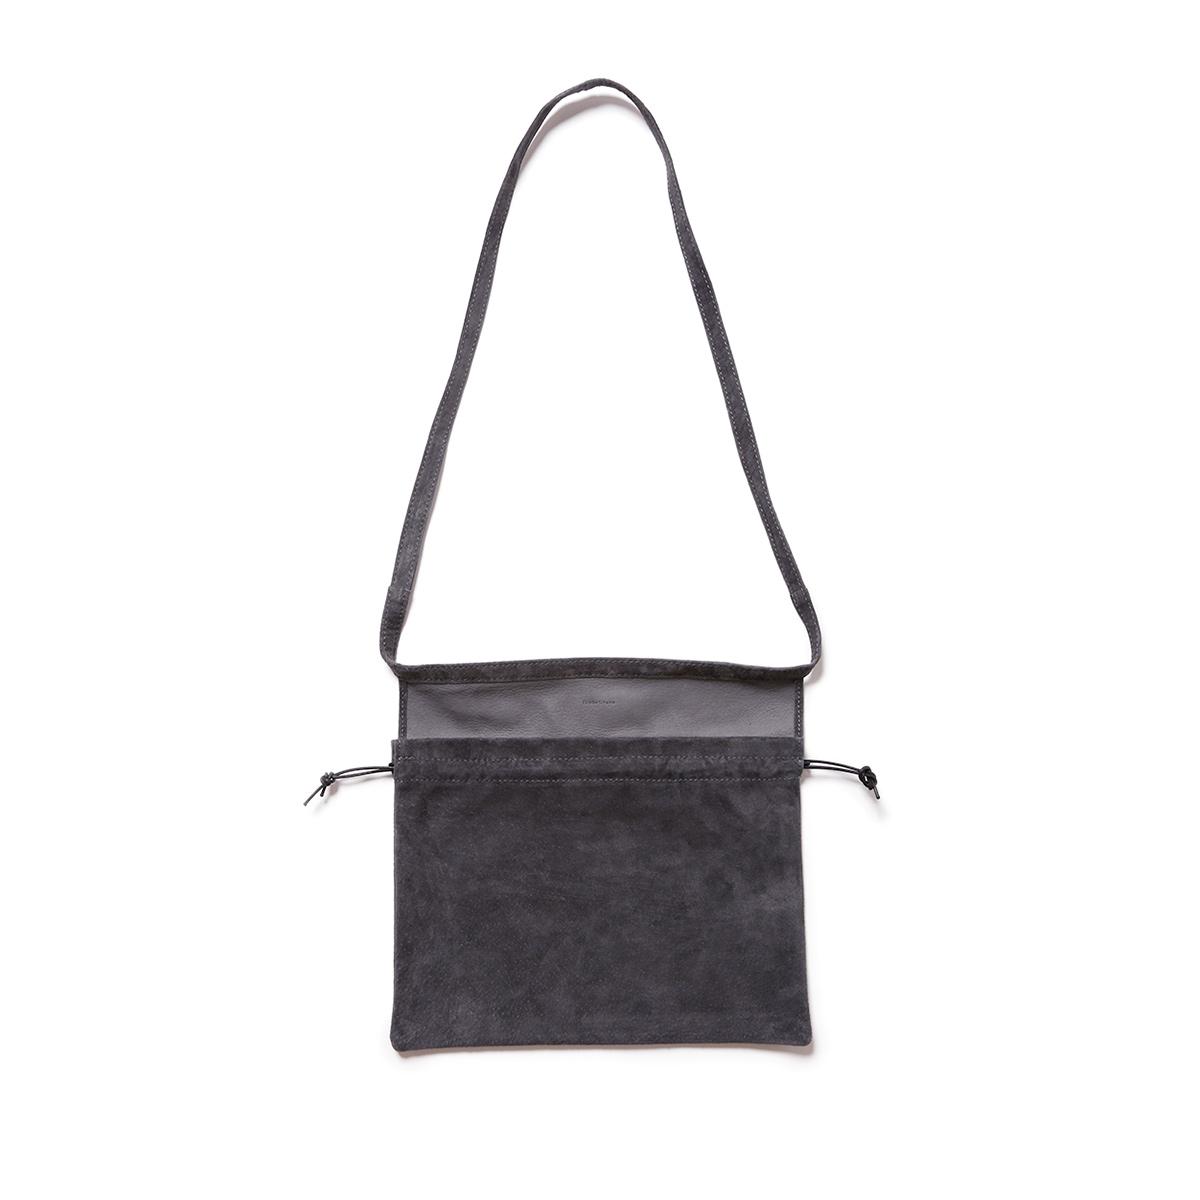 Hender Scheme / red cross bag small -Dark Gray